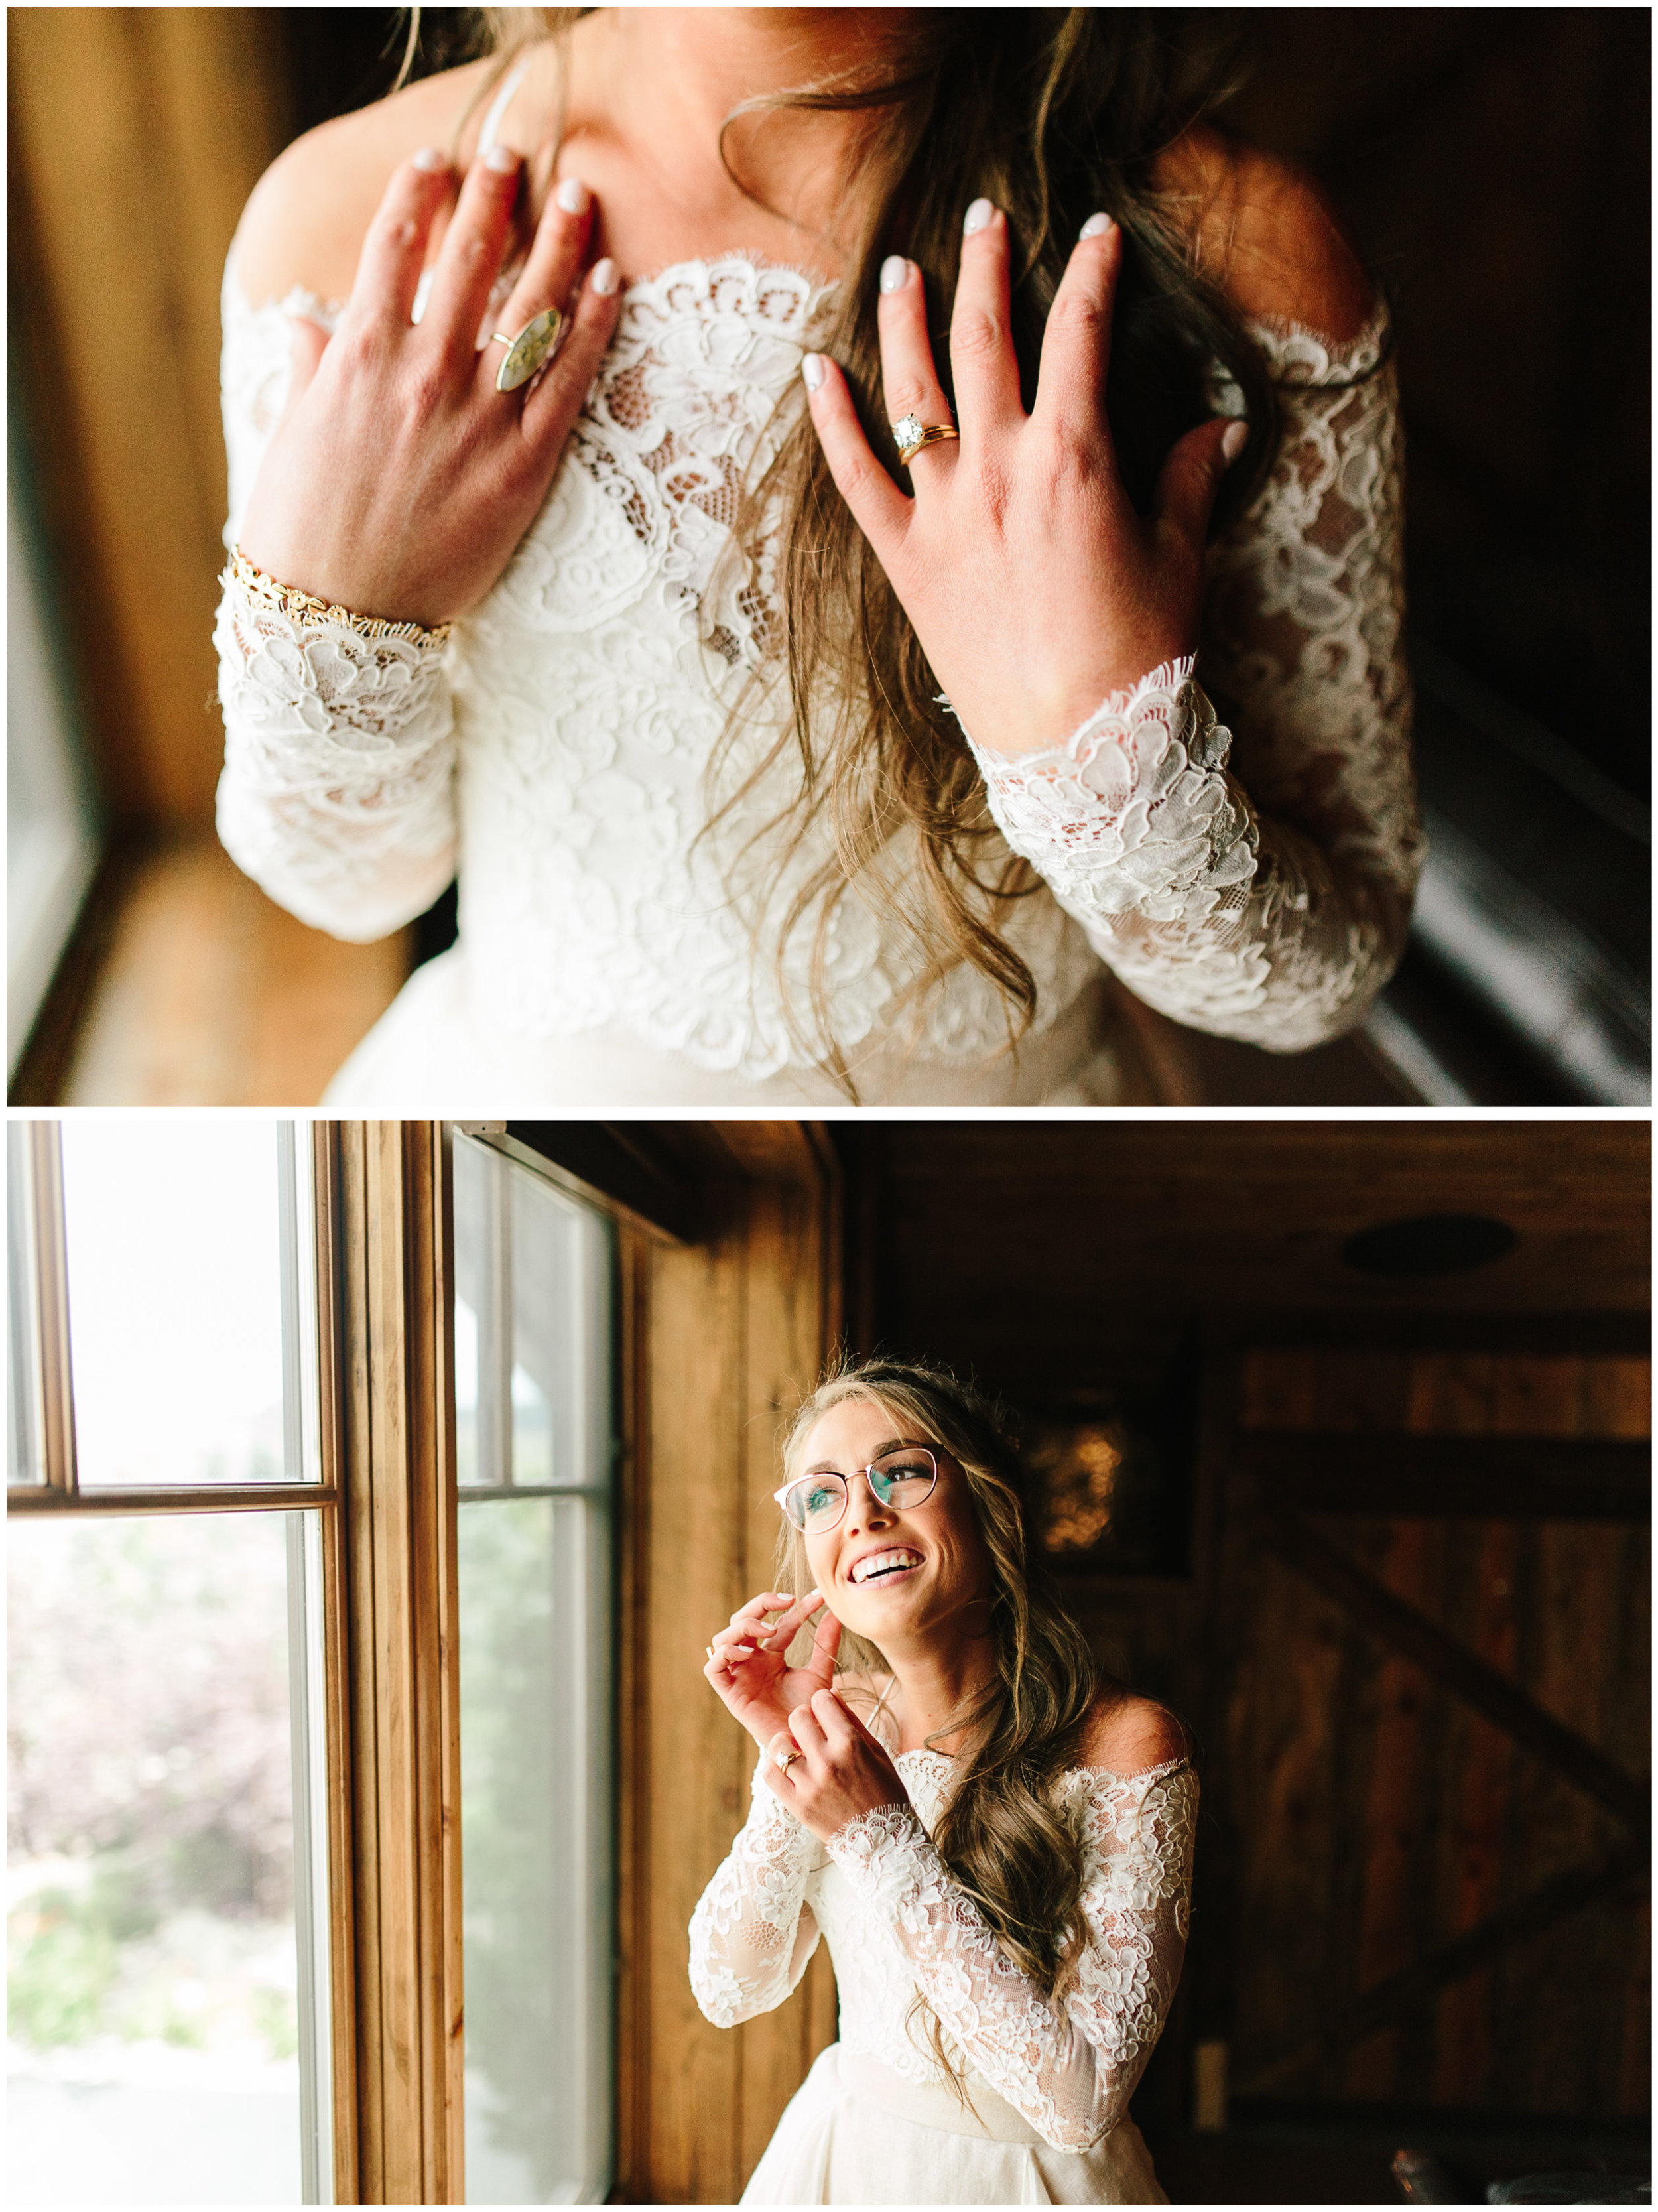 spruce_mountain_ranch_wedding_10.jpg